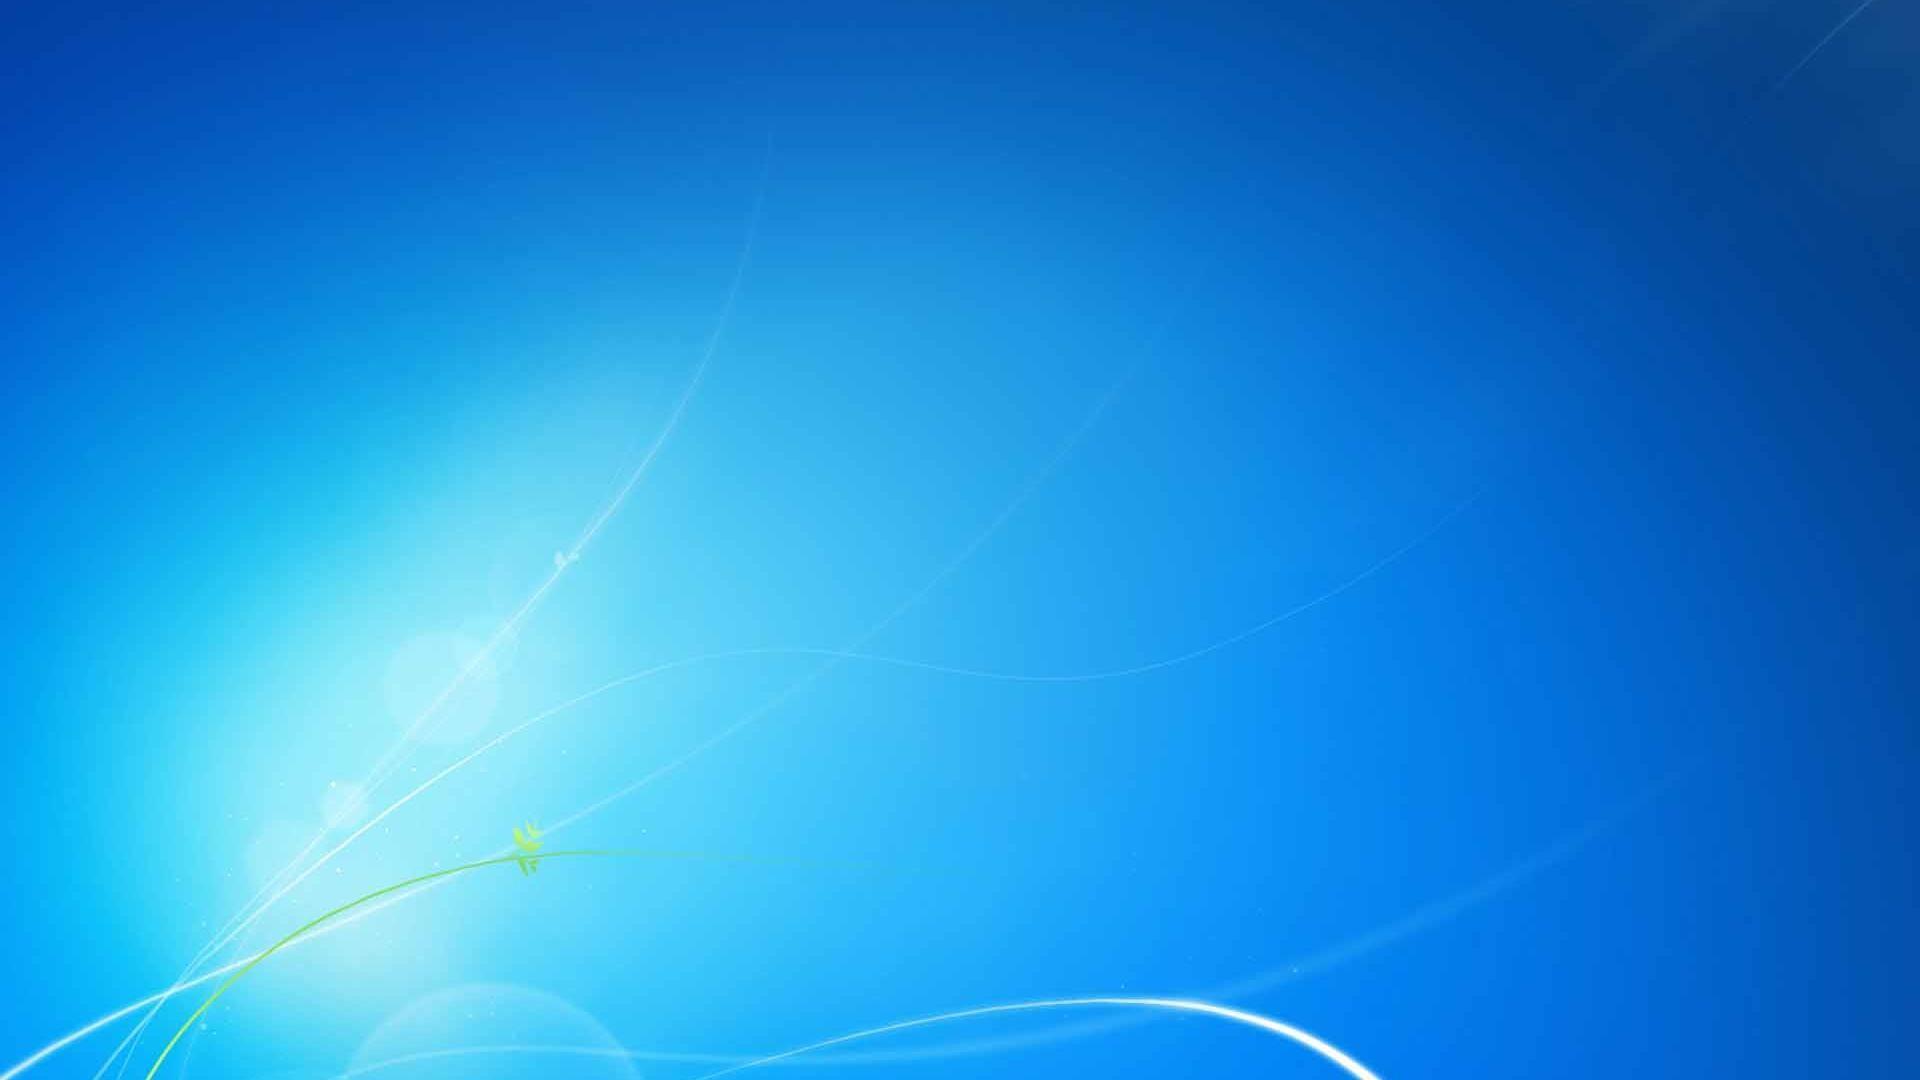 1920x10801440x9001280x800 · cute blue line texture backgrounds